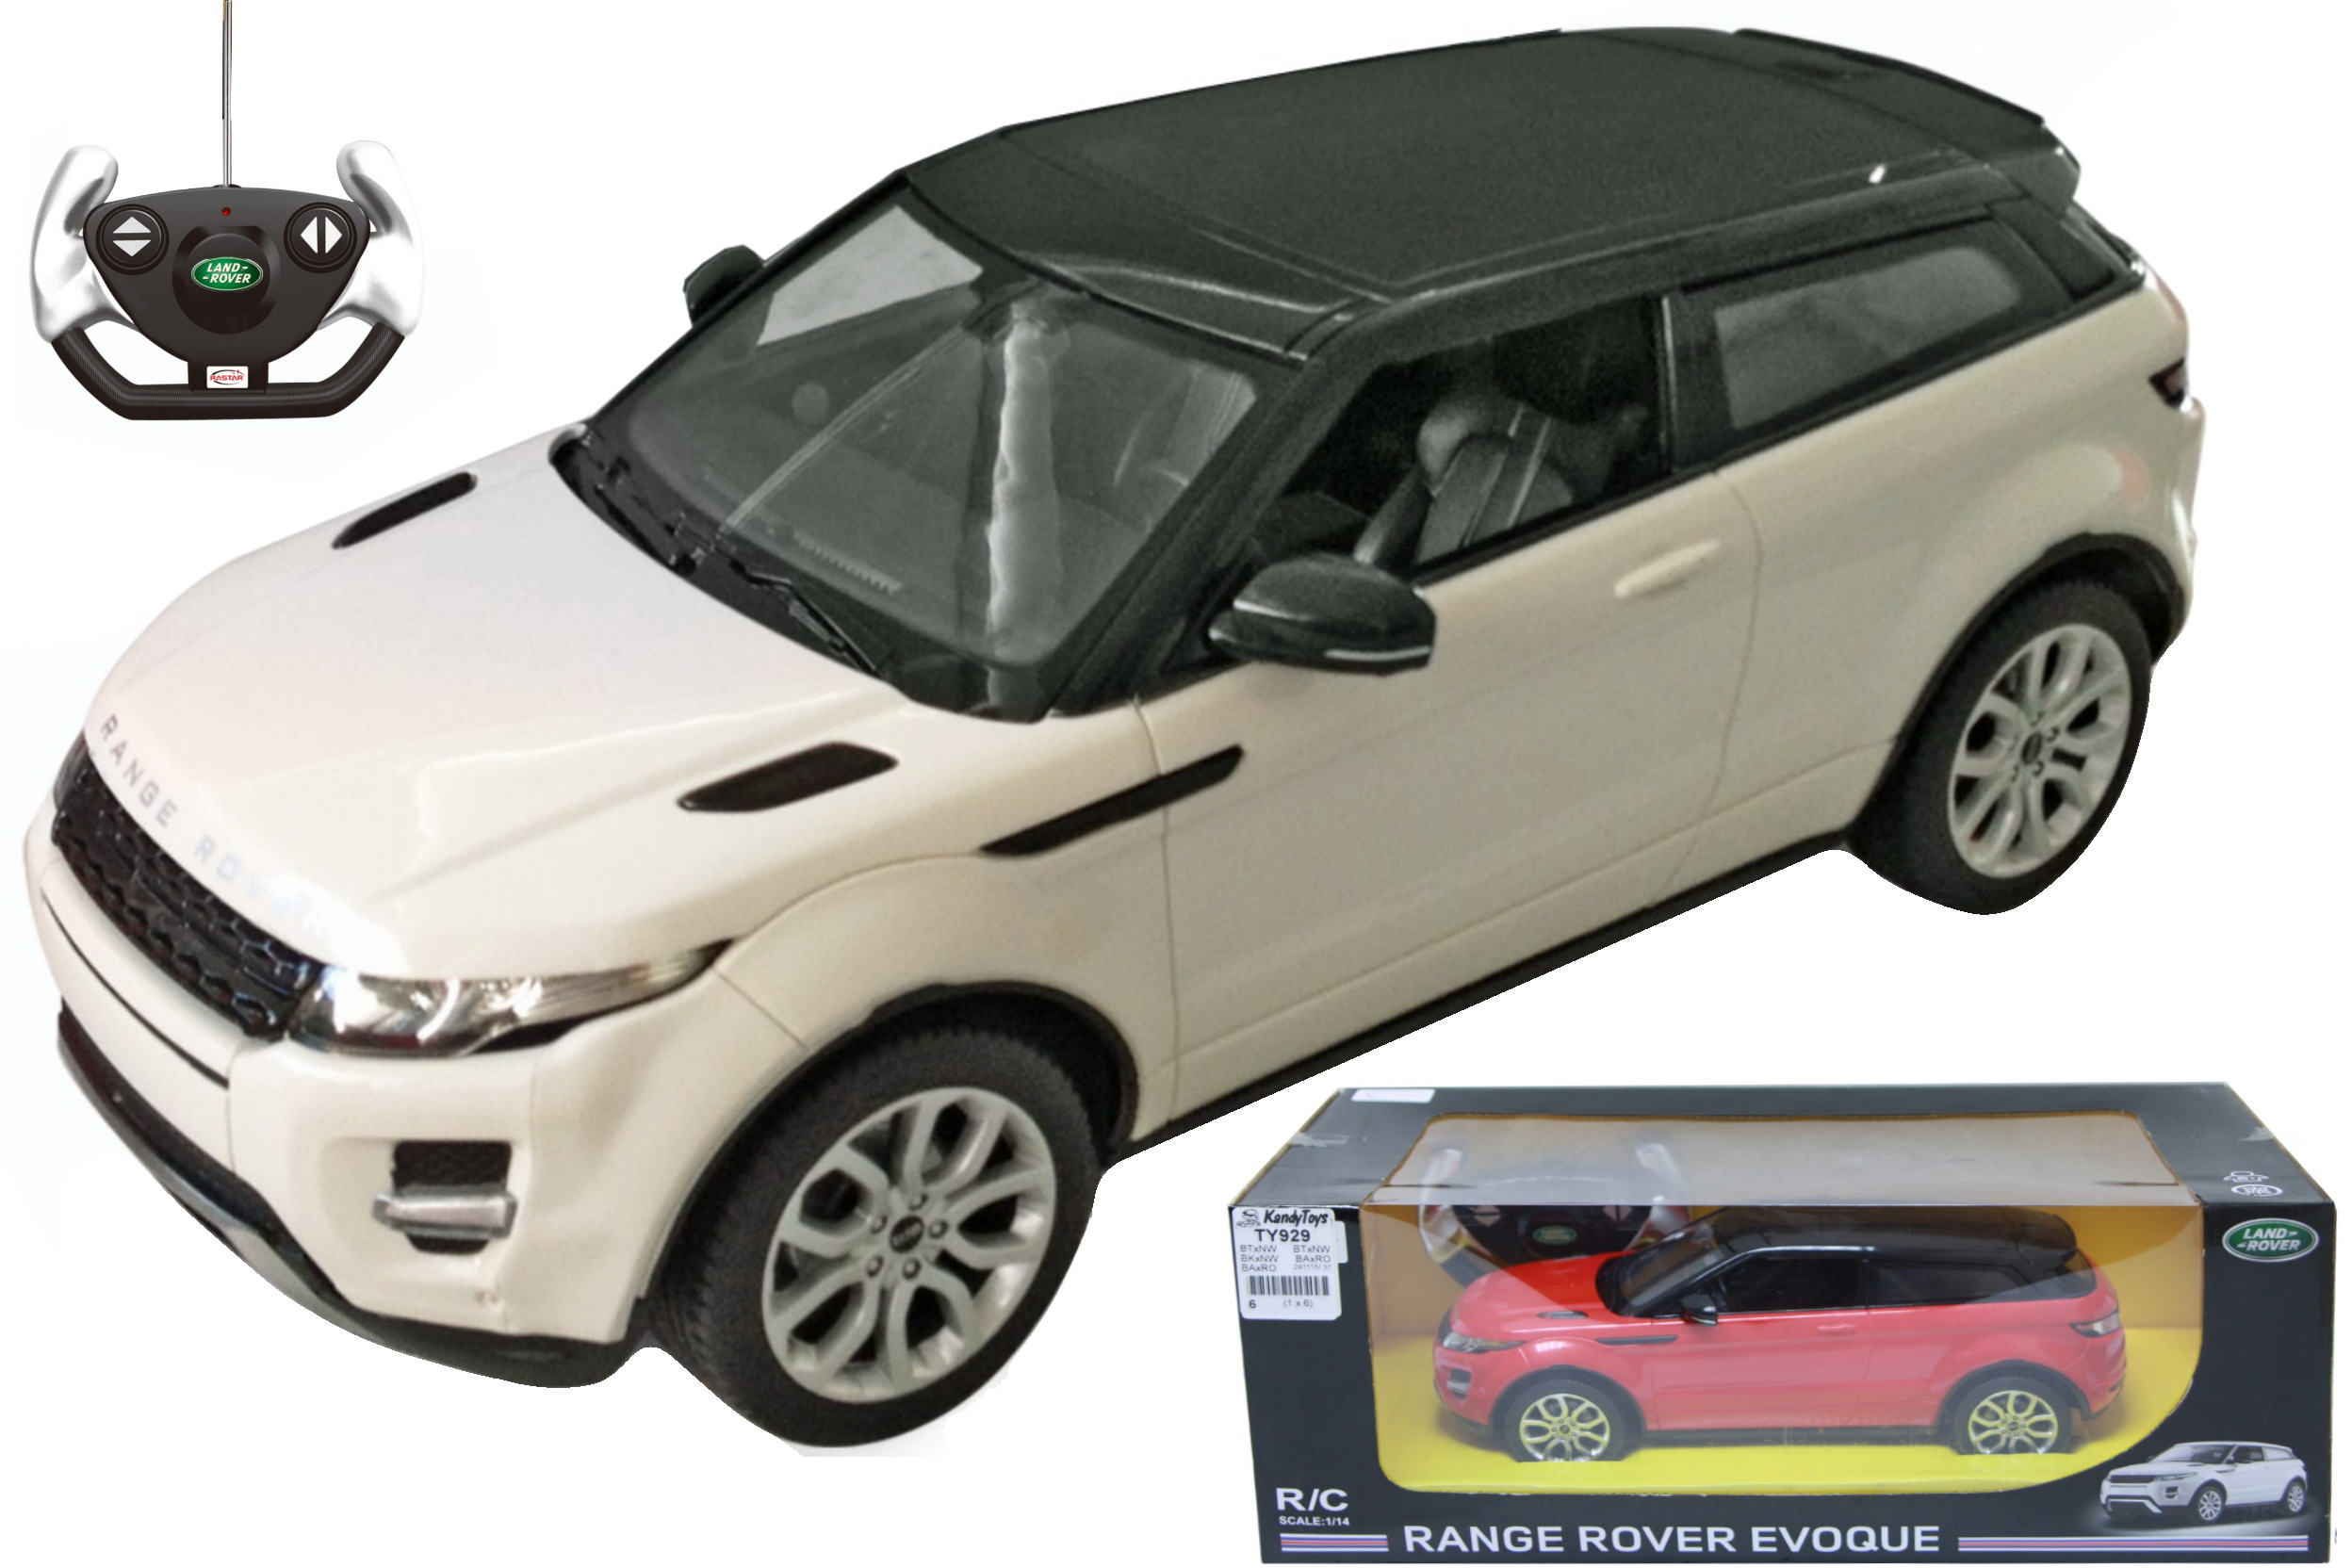 1:14sc Radio Controlled Range Rover Evoque